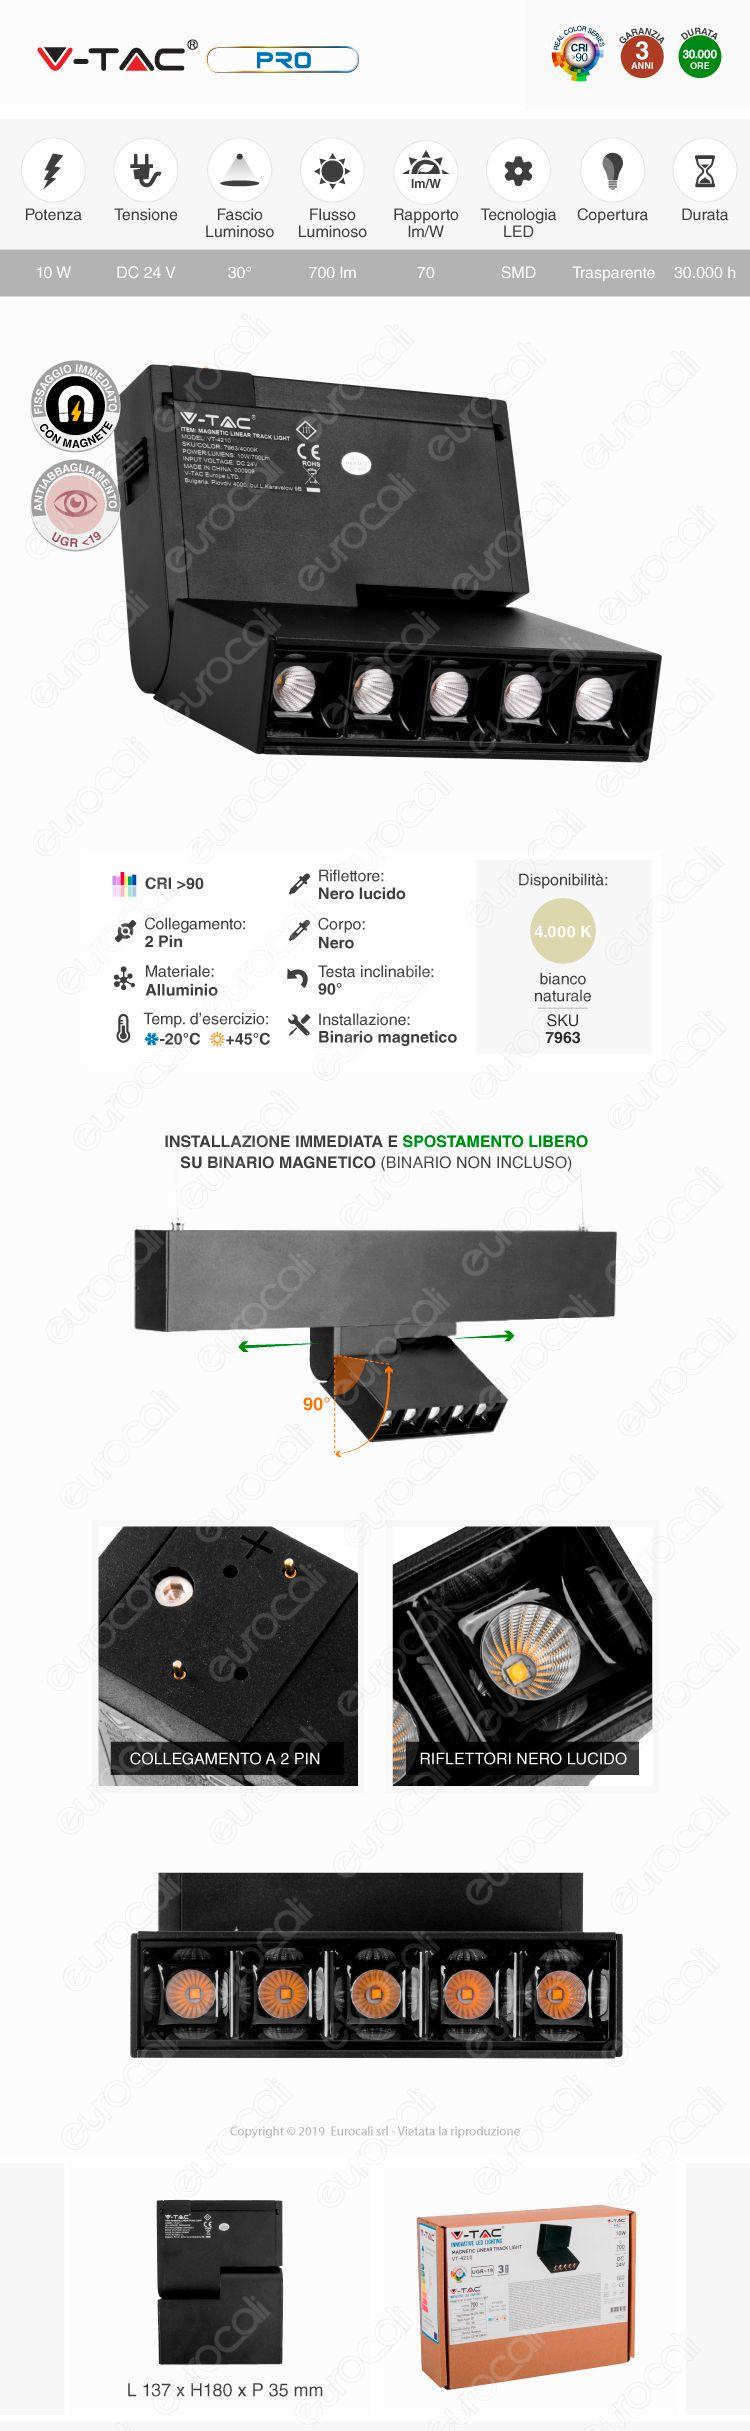 V-Tac PRO VT-4210 Magnetic Linear Spotlight